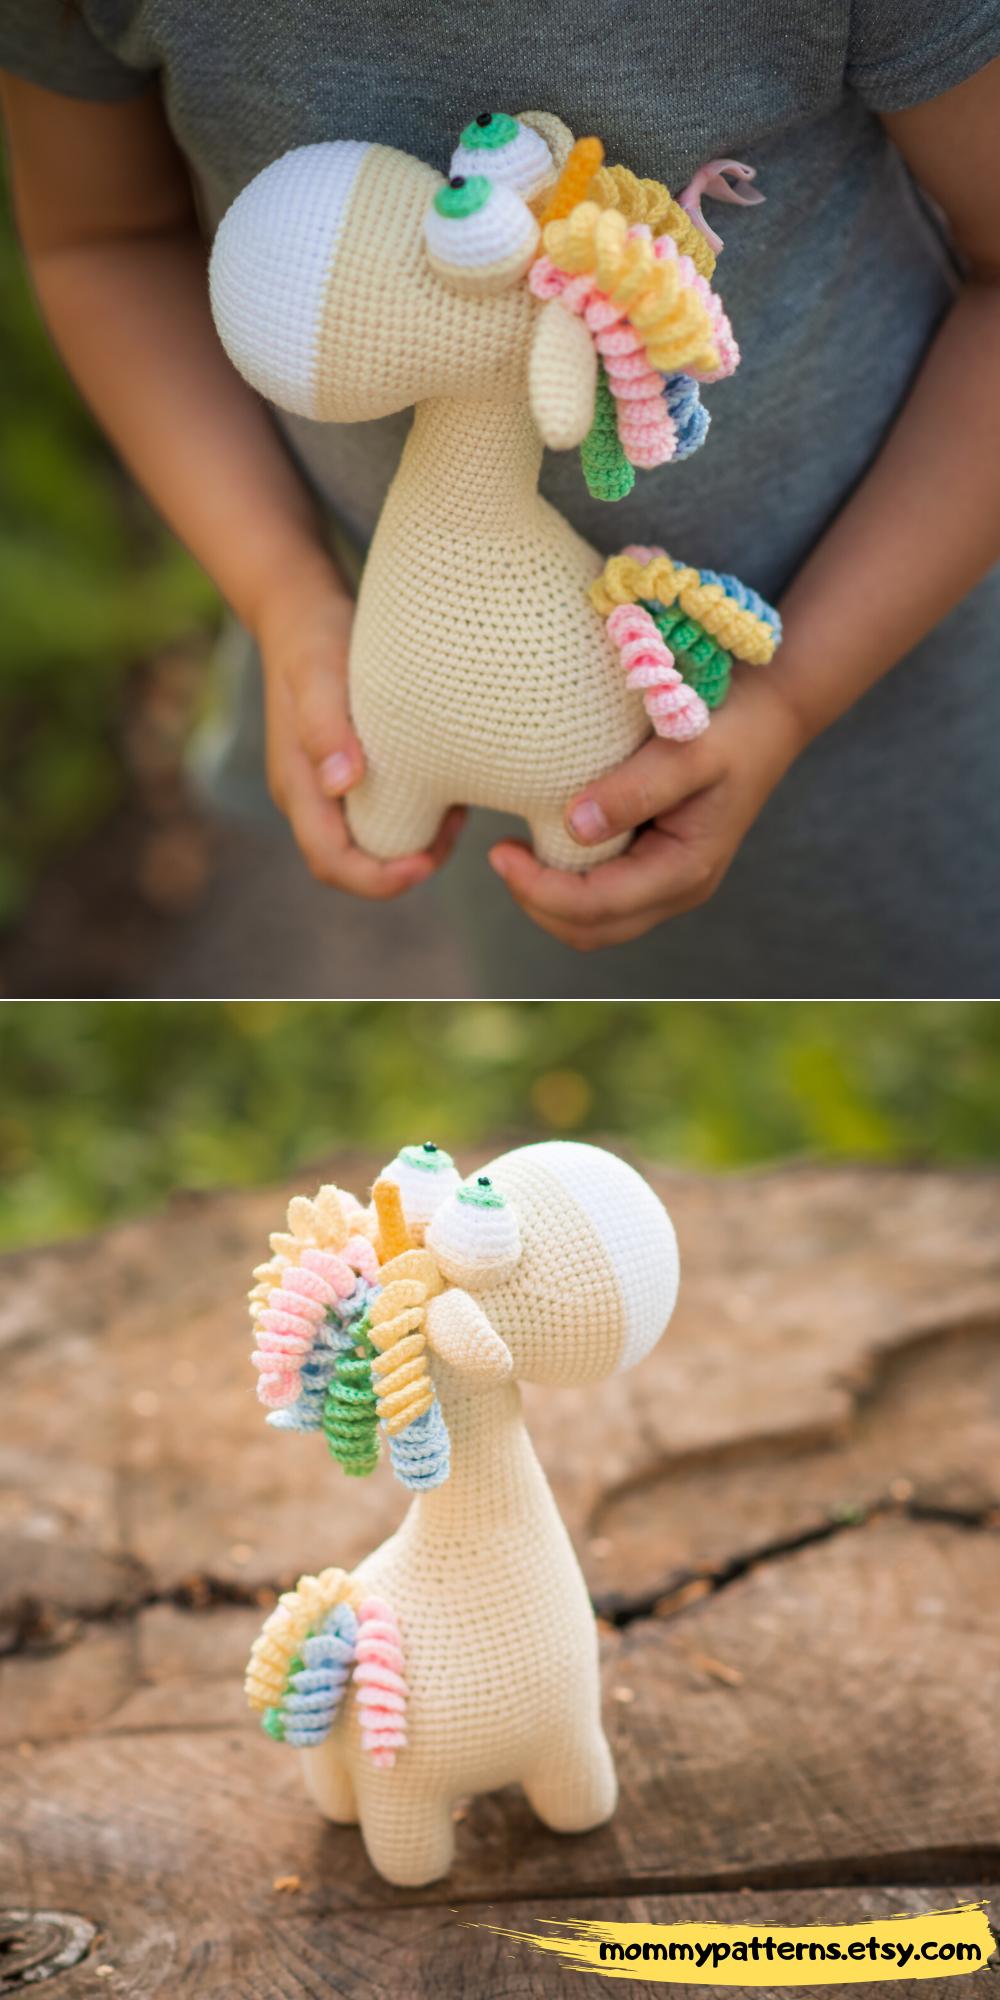 Crochet Pattern Unicorn Crochet Pattern Unicorn Amigurumi Pattern Amigurumi Animals Crochet Pattern Toy In 2021 Crochet Patterns Crochet Toys Patterns Crochet Unicorn